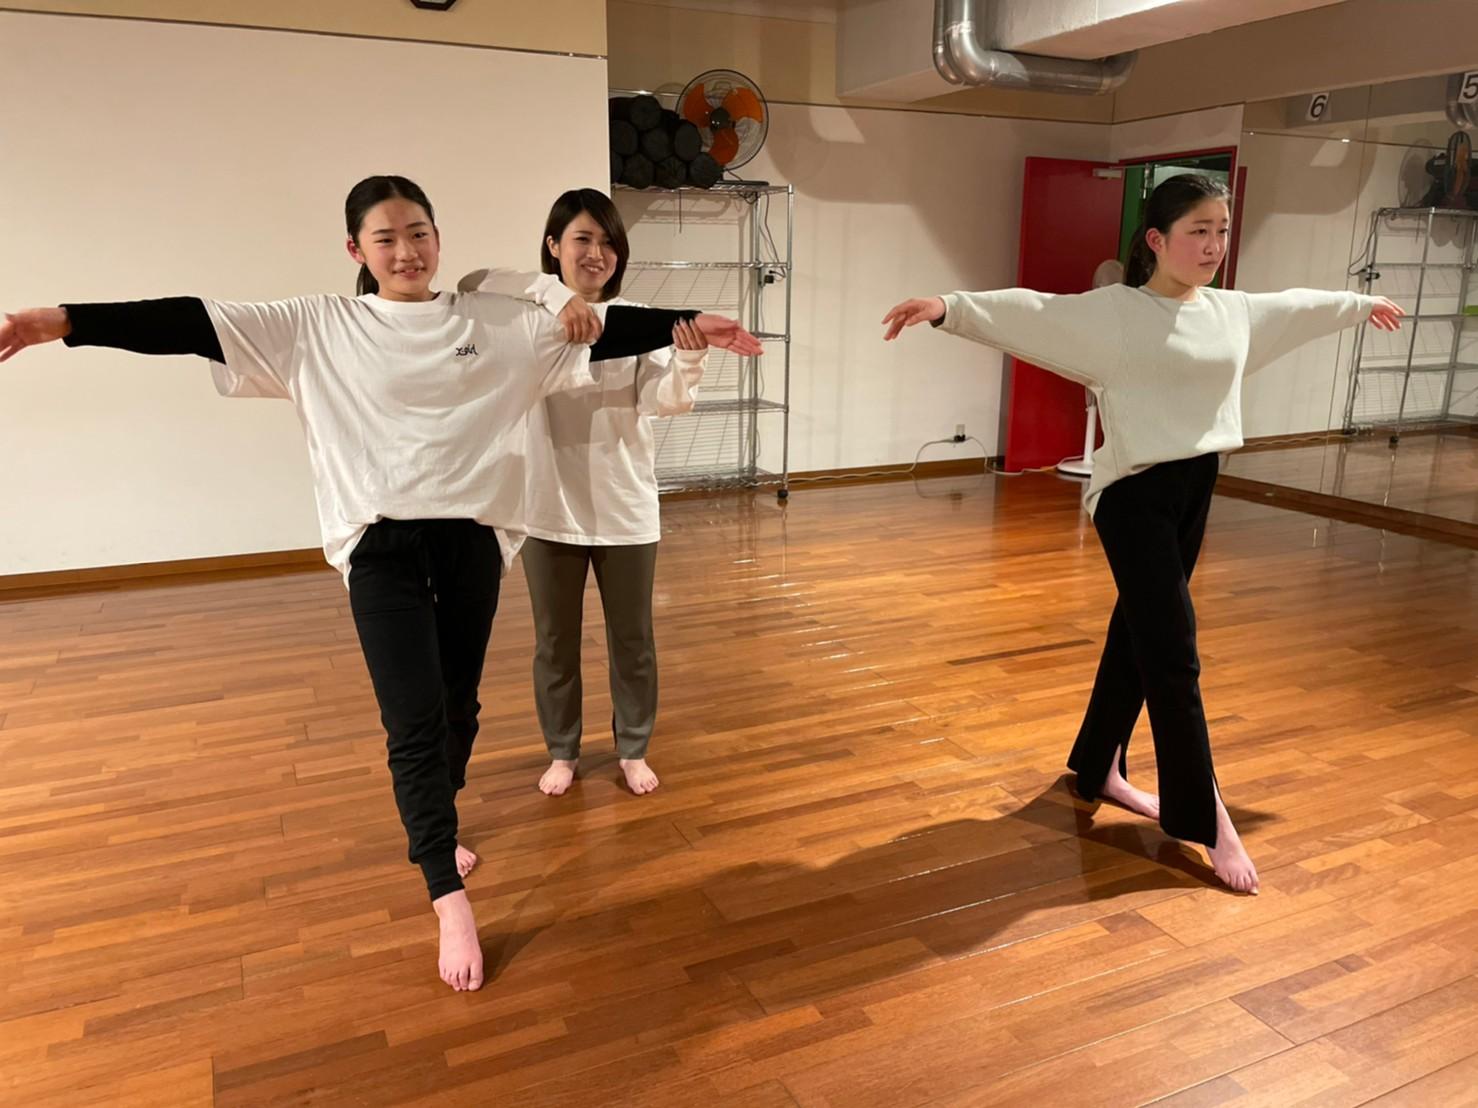 BASIC<em>ダンス基礎クラス</em>